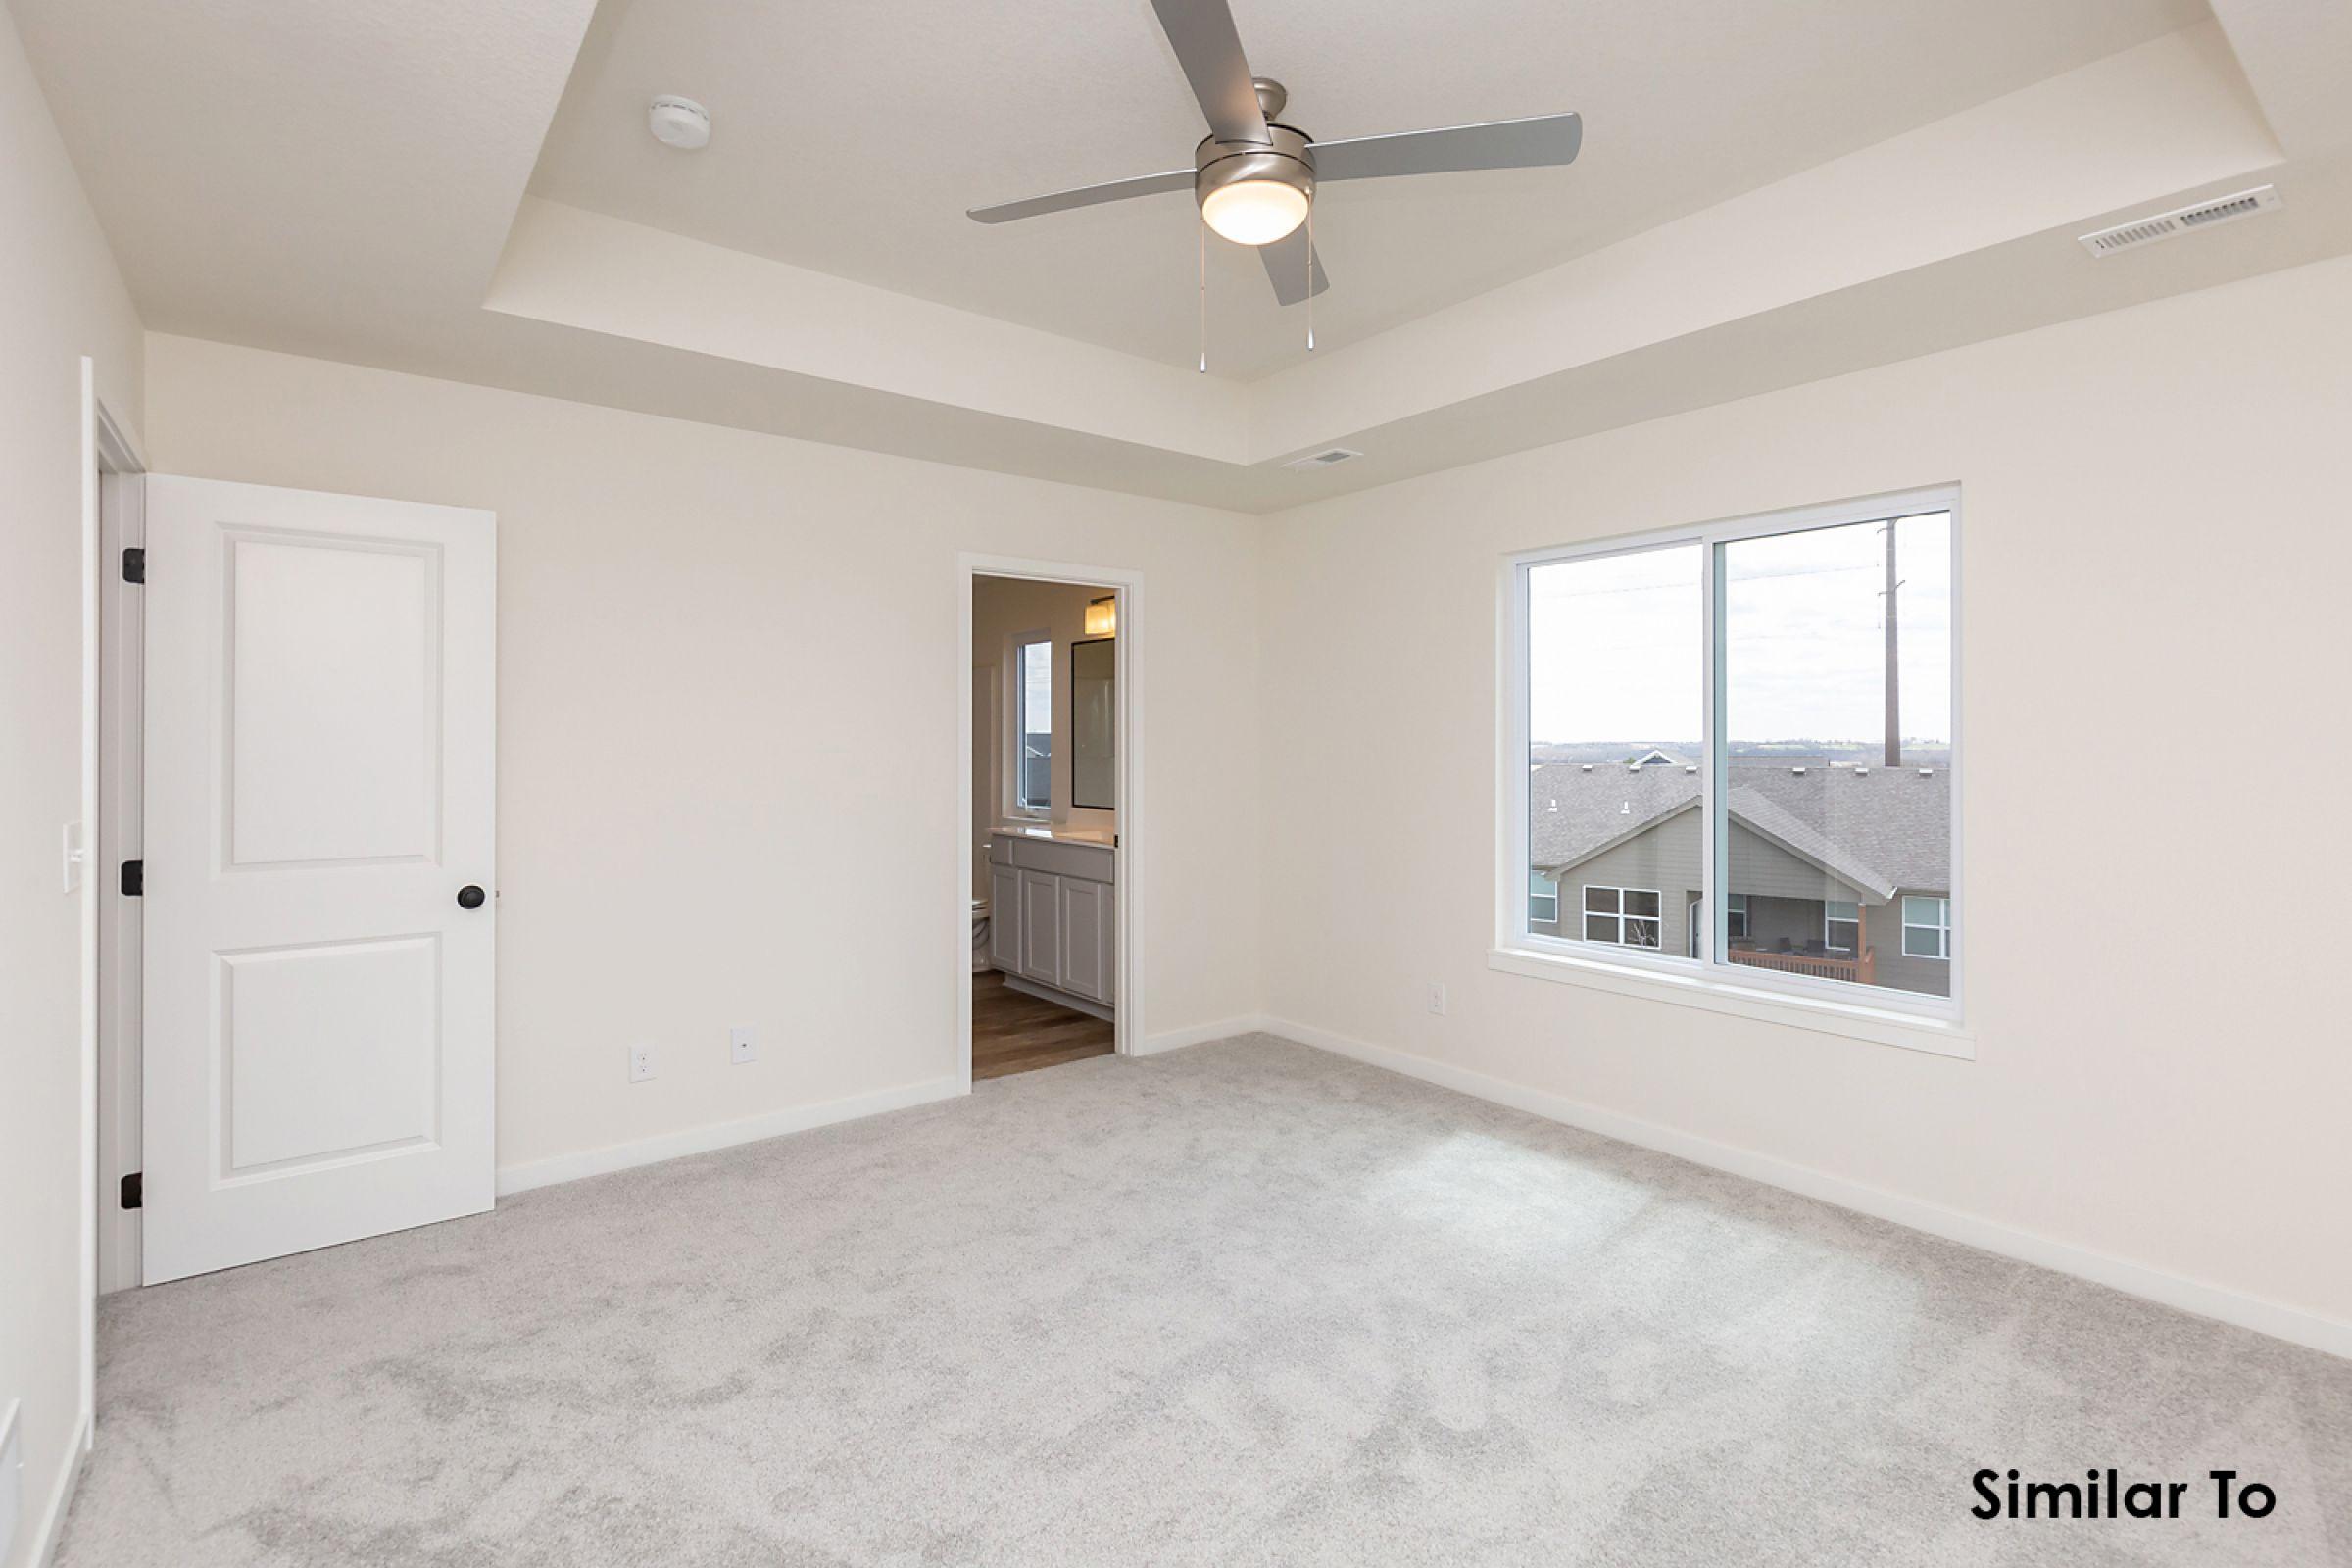 residential-warren-county-iowa-0-acres-listing-number-15134-12-2020-08-27-185029.jpg